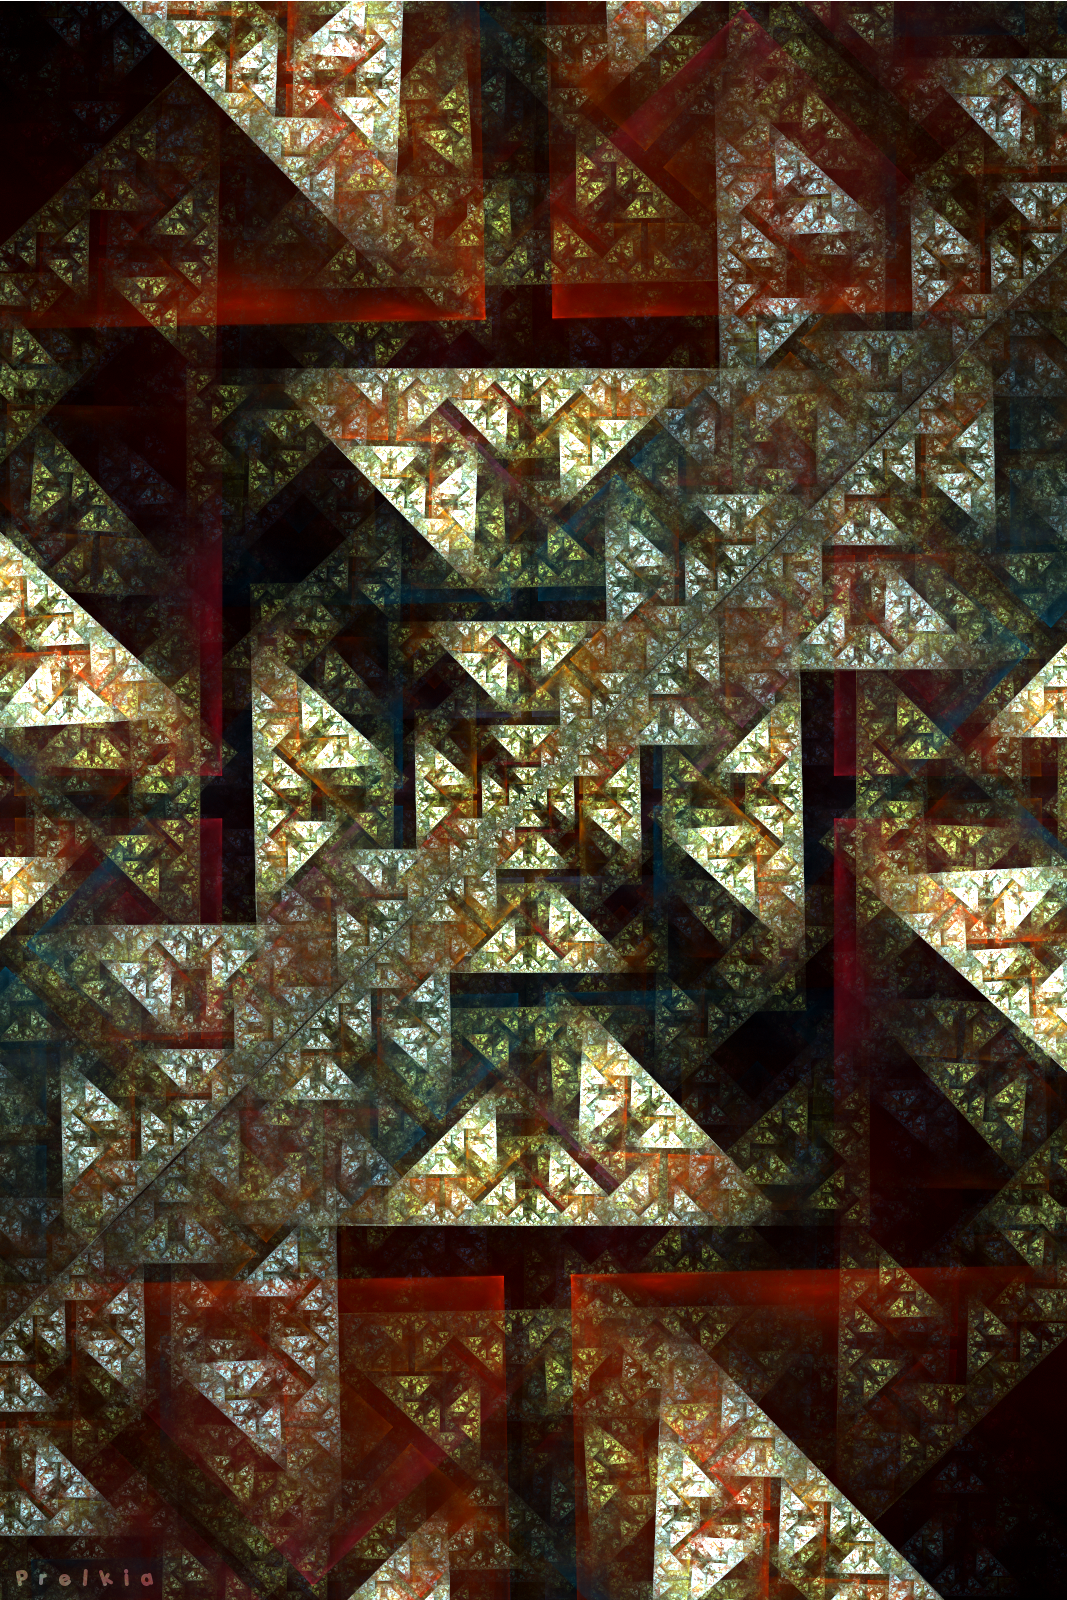 Corrosion by Prelkia